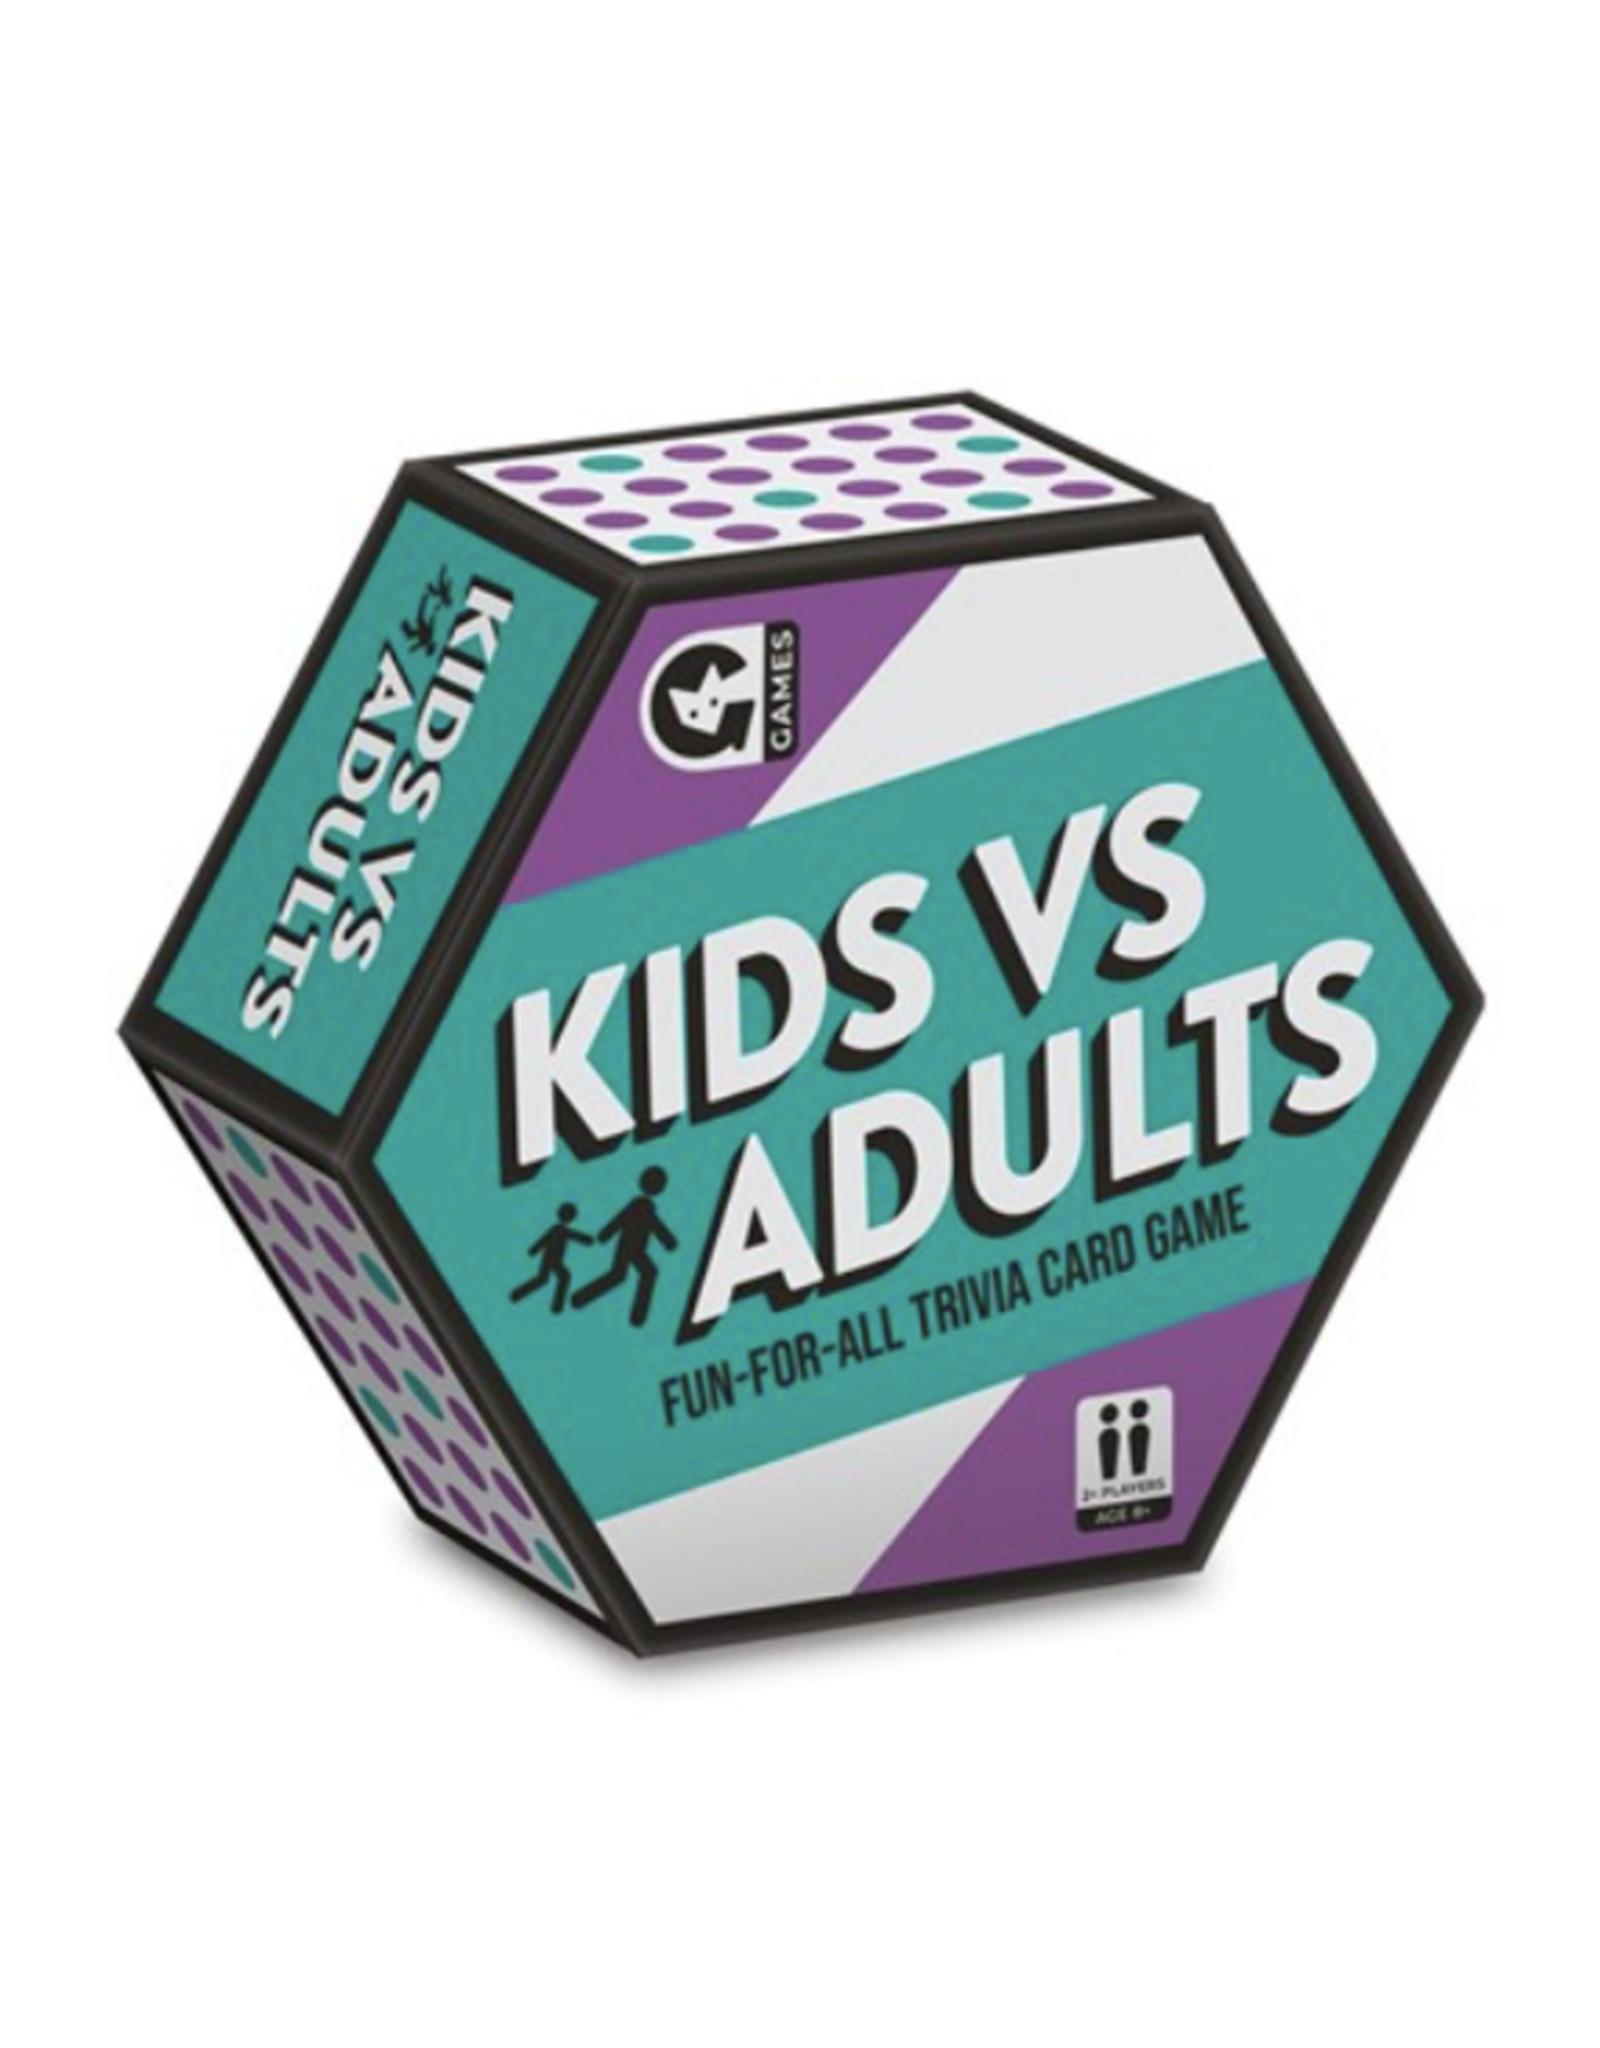 Kids vs Adults Card Game